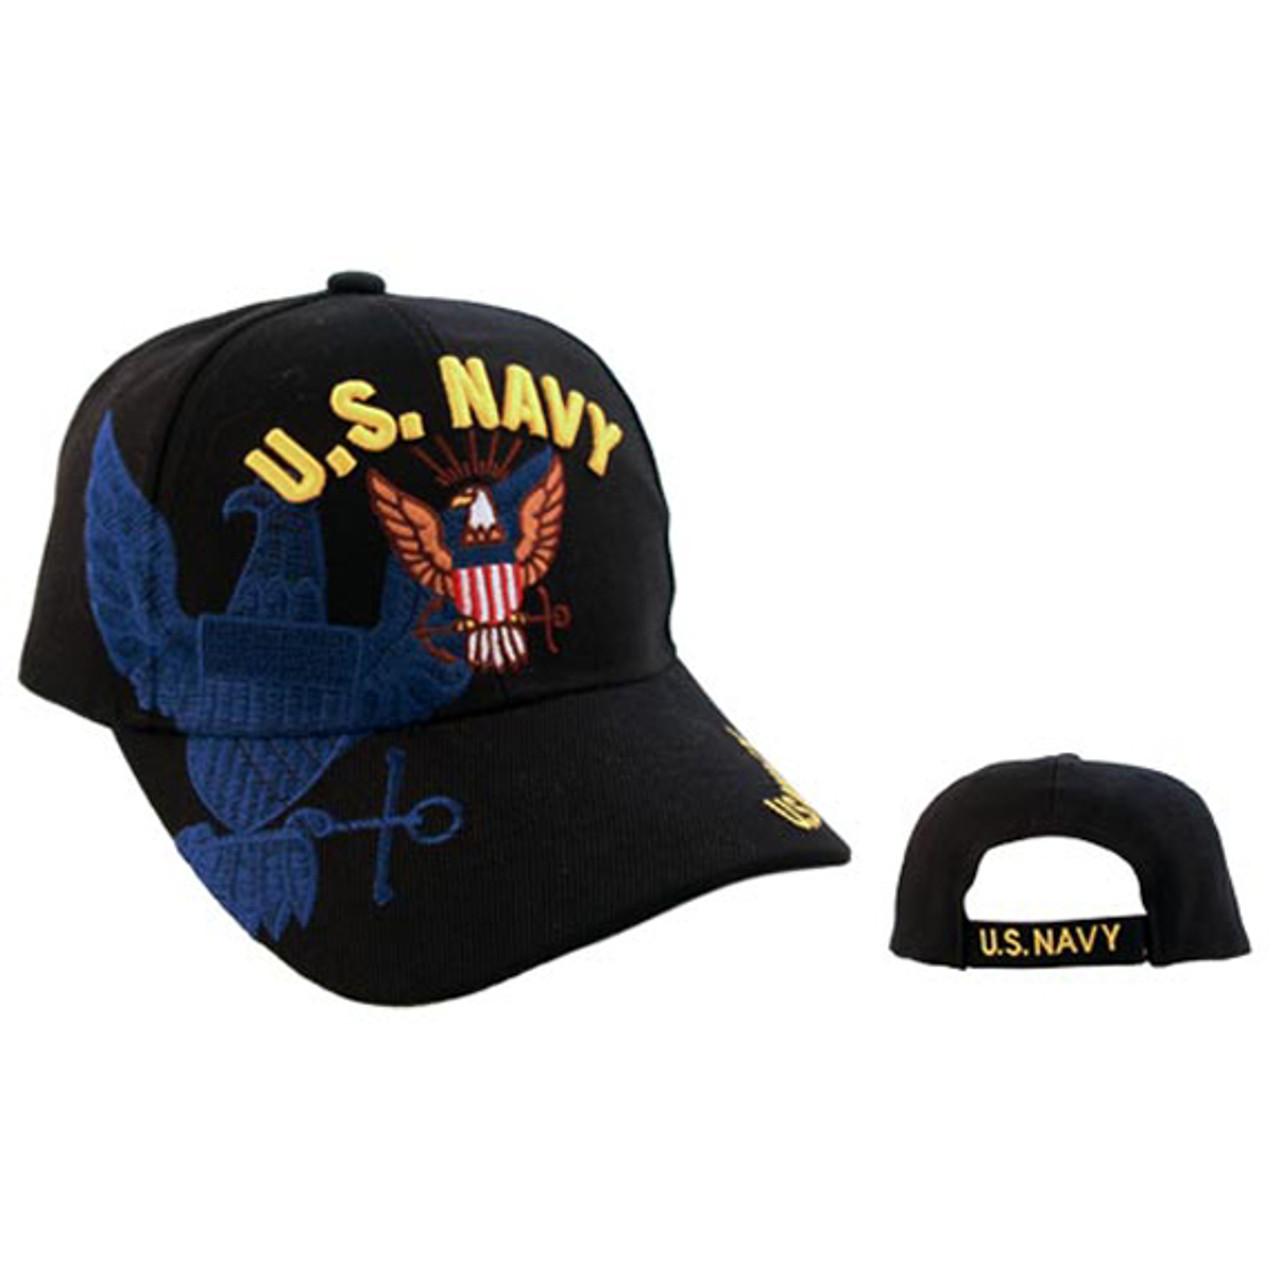 "Wholesale Military Caps C1019 (1 pc.) ""U.S. Navy"" Black"